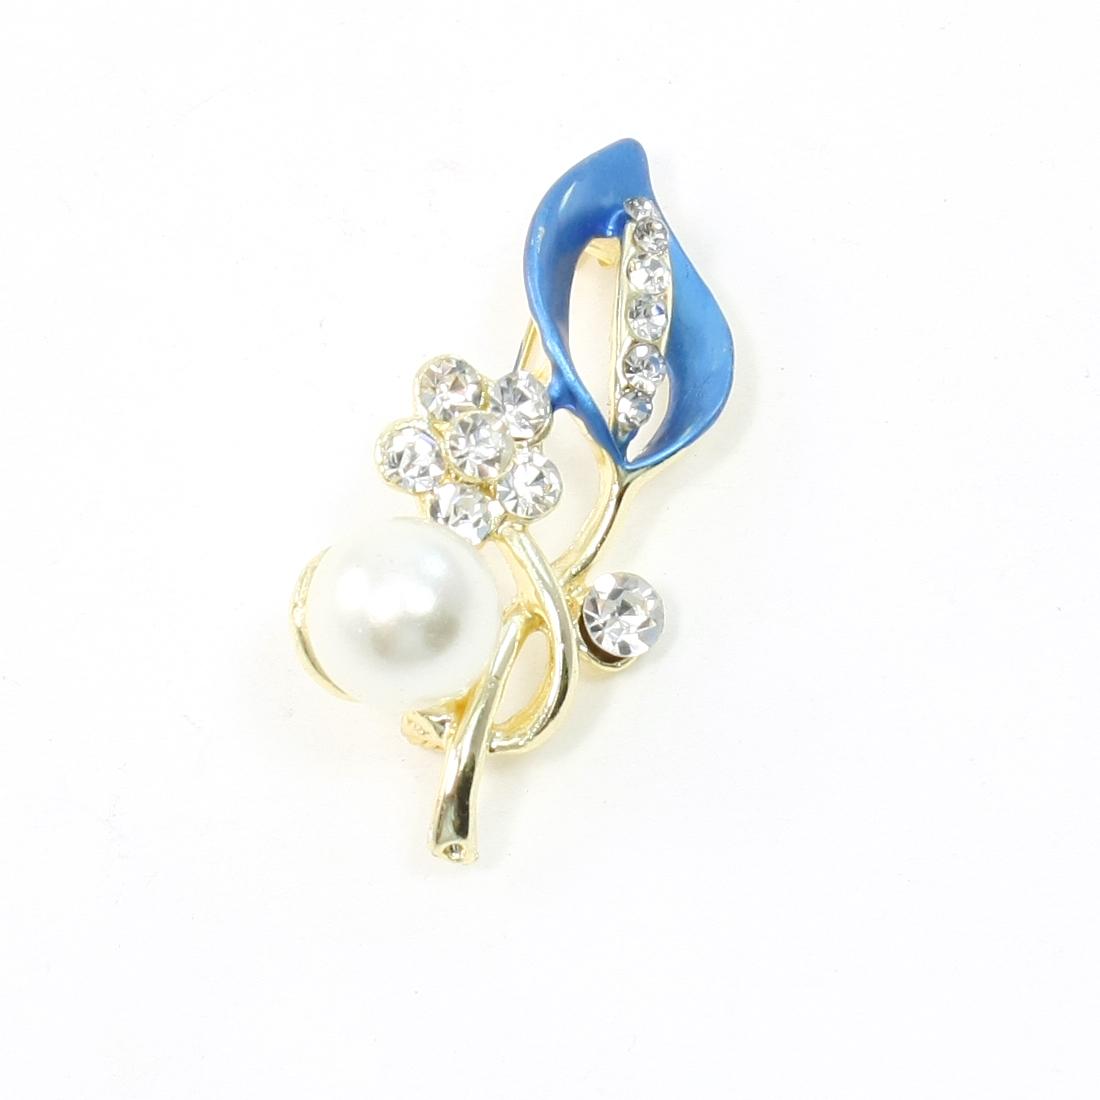 Plastic Pearl Rhinestone Flower Accent Leave Brooch Breastpin Indigo Blue for Lady